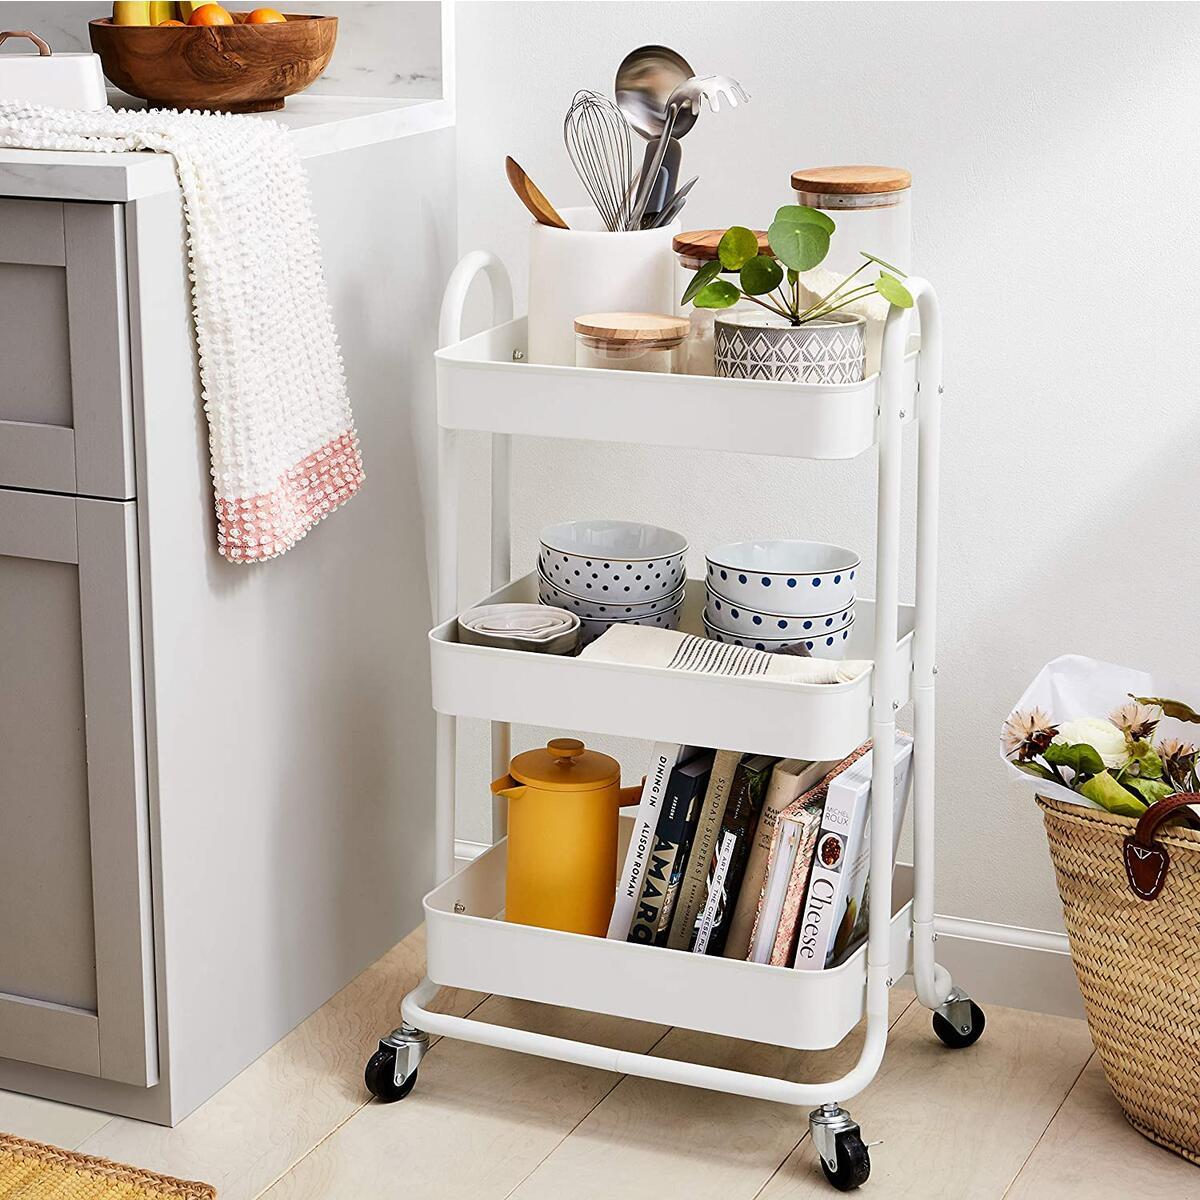 AmazonBasics 3-Tier Rolling Utility or Kitchen Cart - White